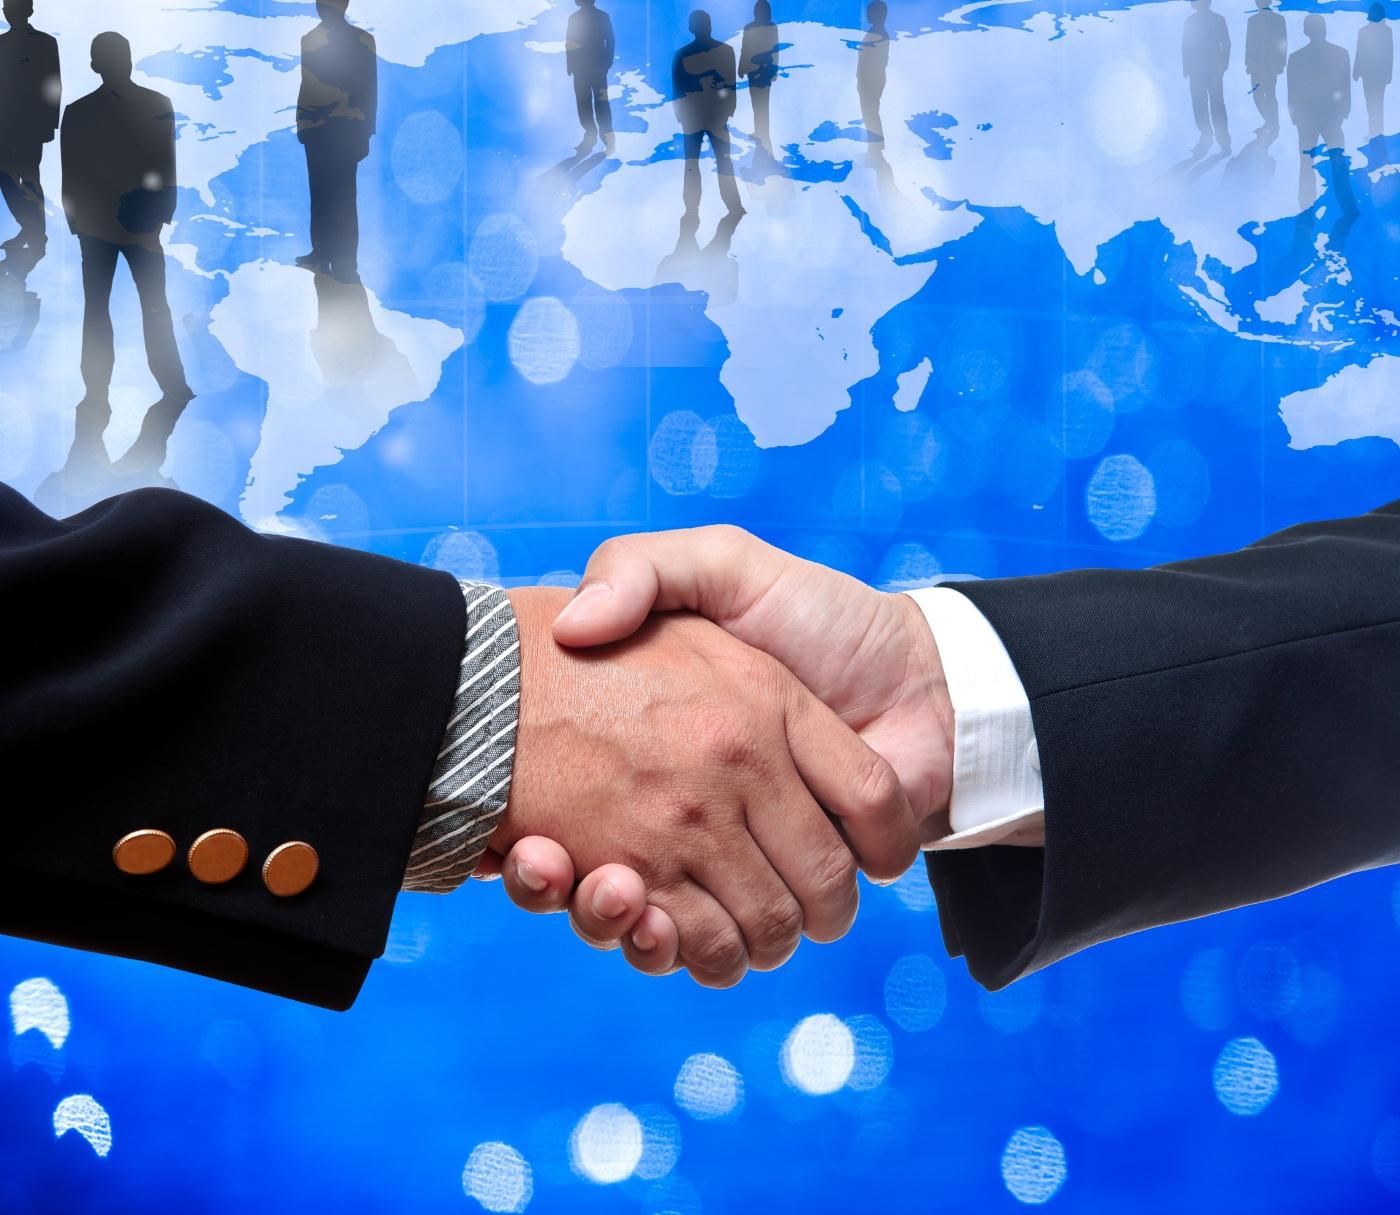 Handshake on a deal